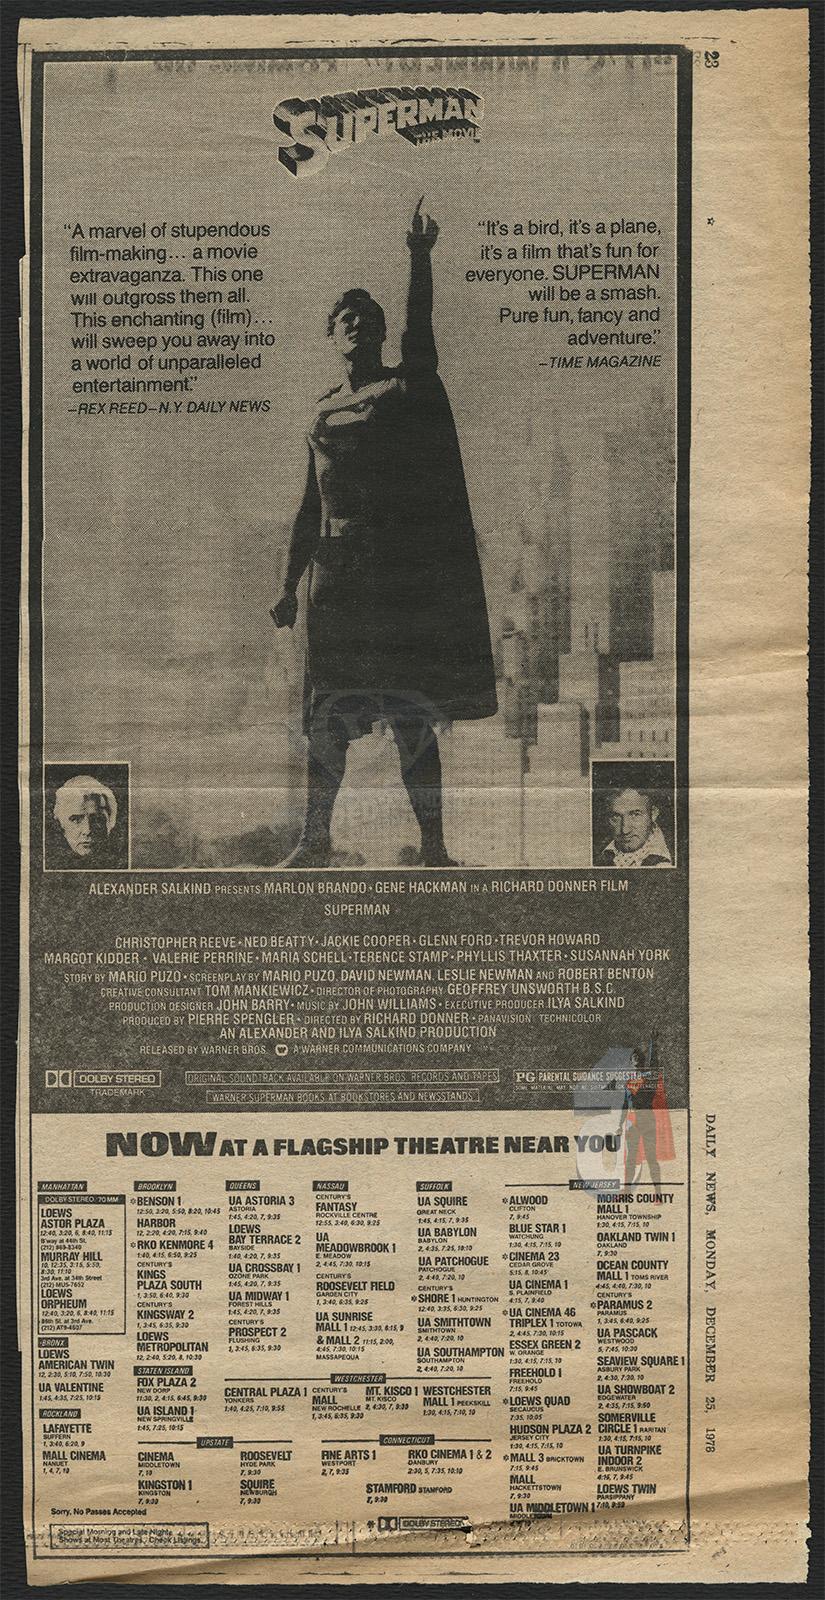 CW-STM-New-York-Daily-News-Mon-Dec-25-78